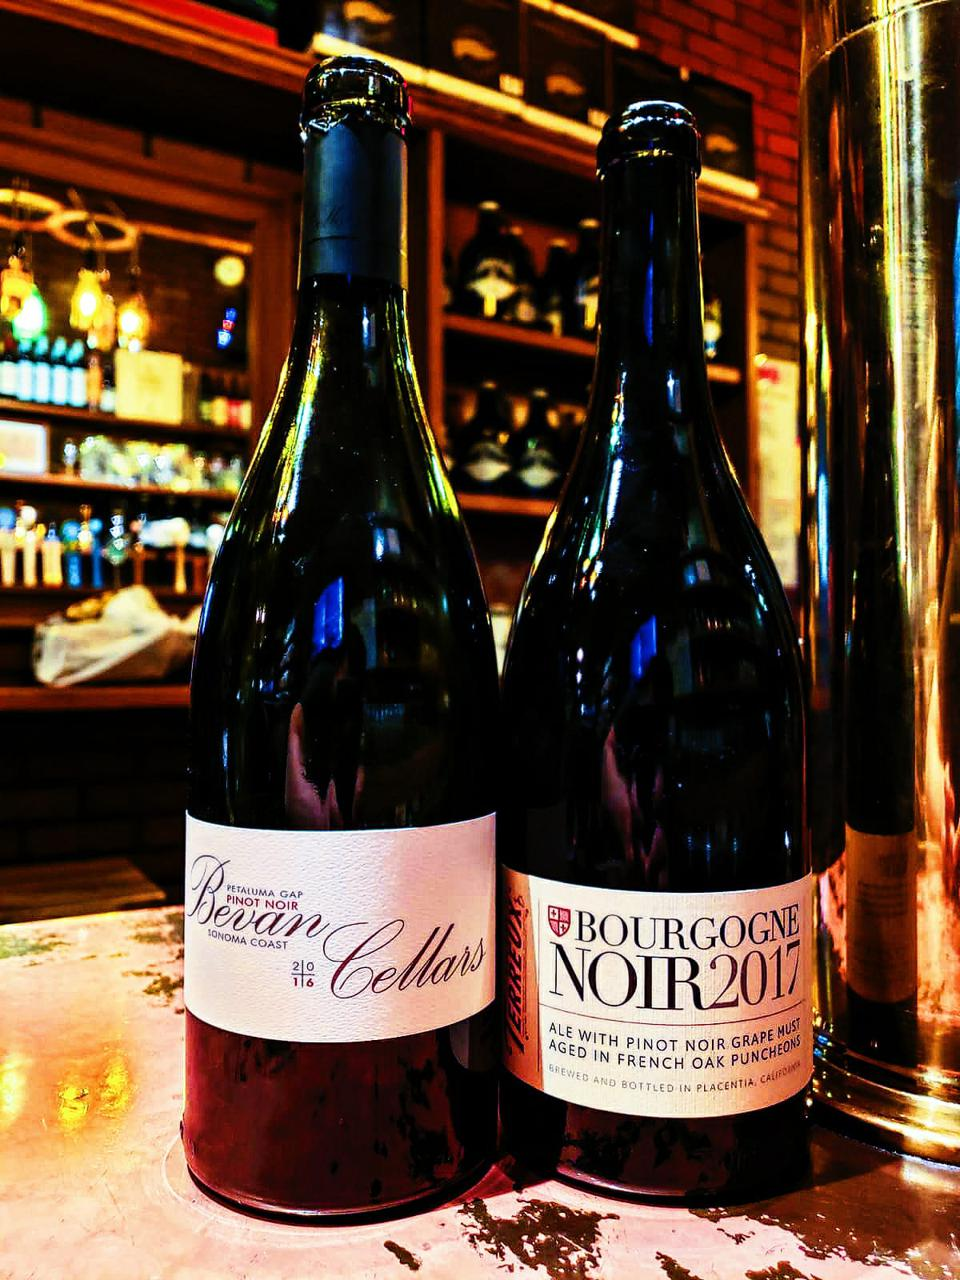 Bevan Cellars Petaluma Gap Pinot Noir (2016) and Bourgogne Noir by The Bruery.